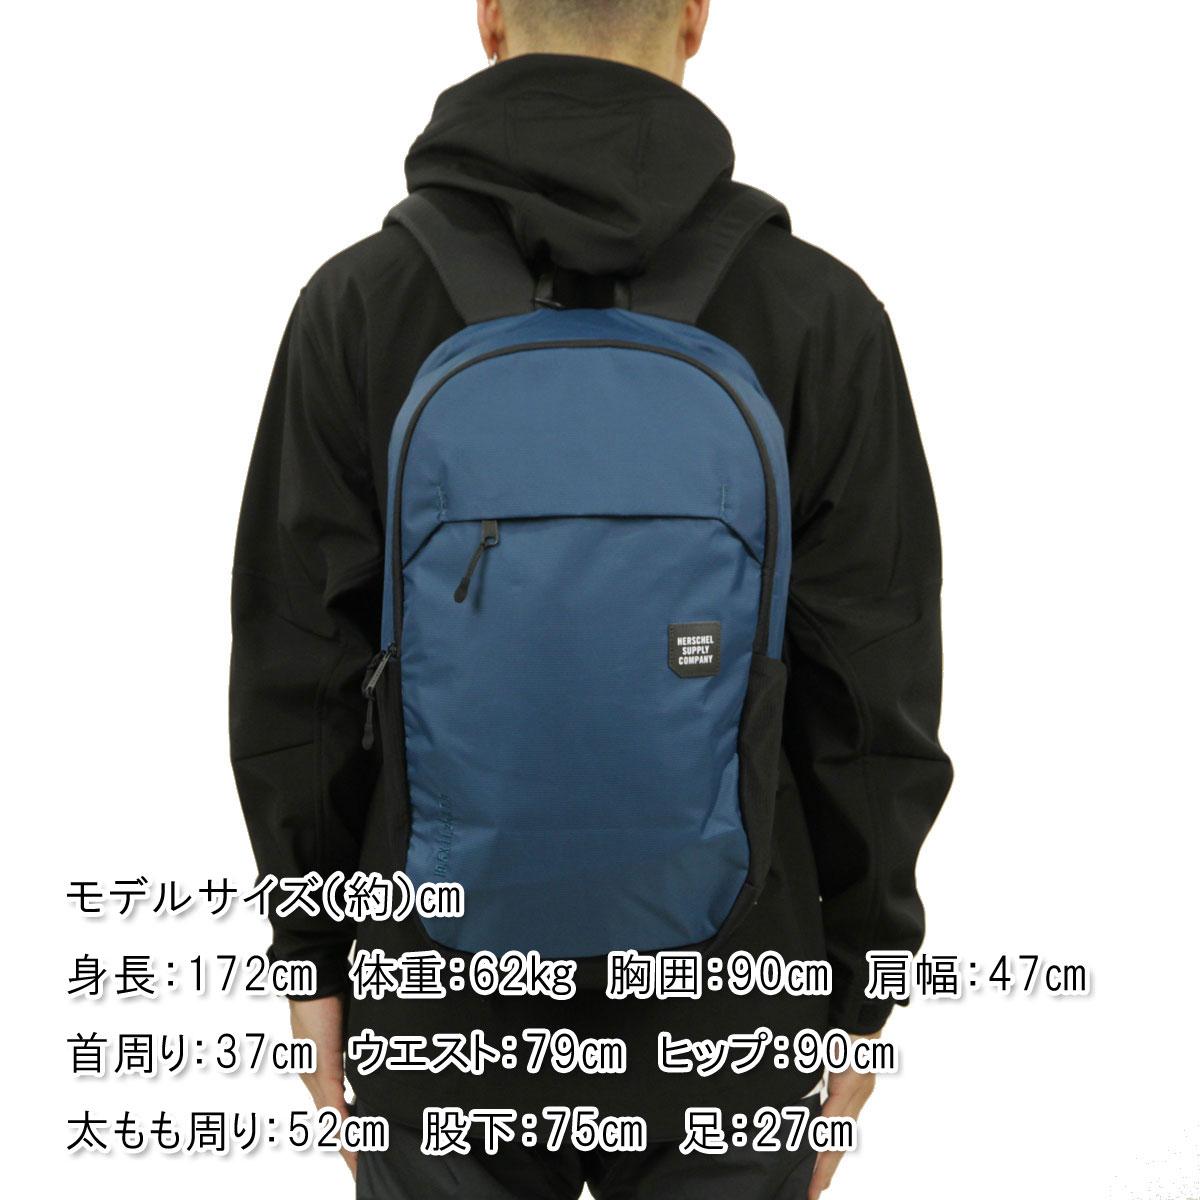 Hershel Herschel Supply regular store bag MAMMOTH BACKPACK LARGE TRAIL  10322-01389-OS LEGION BLUE BLACK 2a18e5f0e18b5